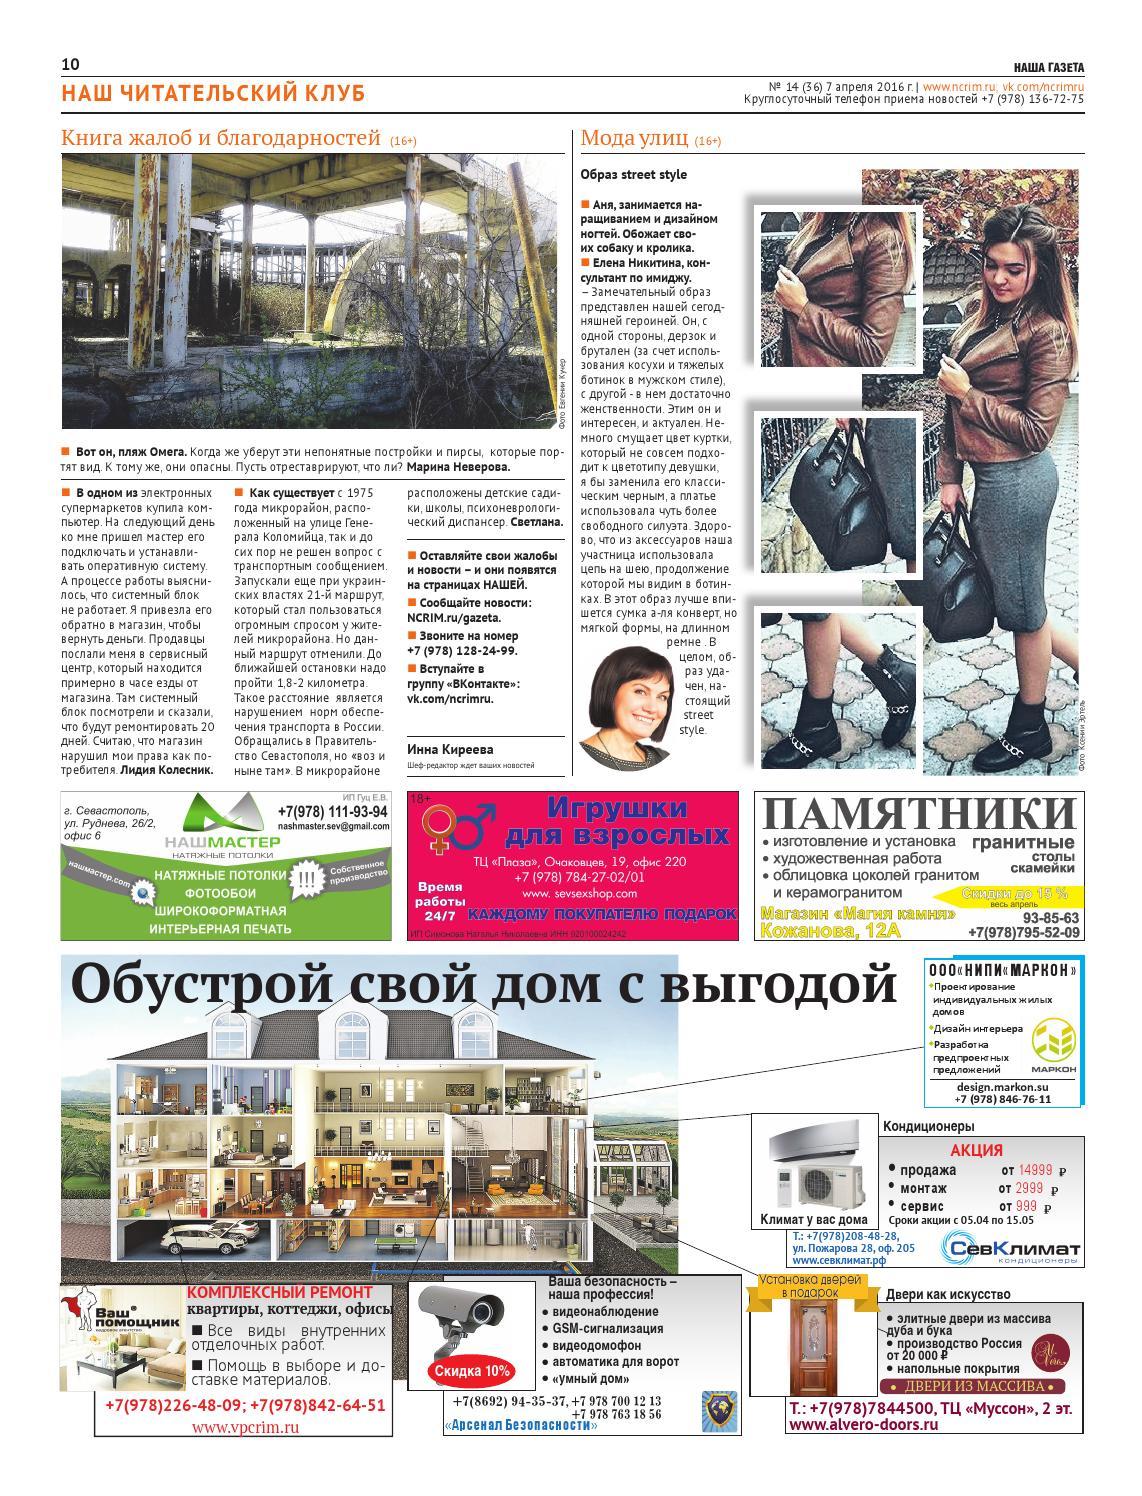 знакомства в газета позвони севастополе